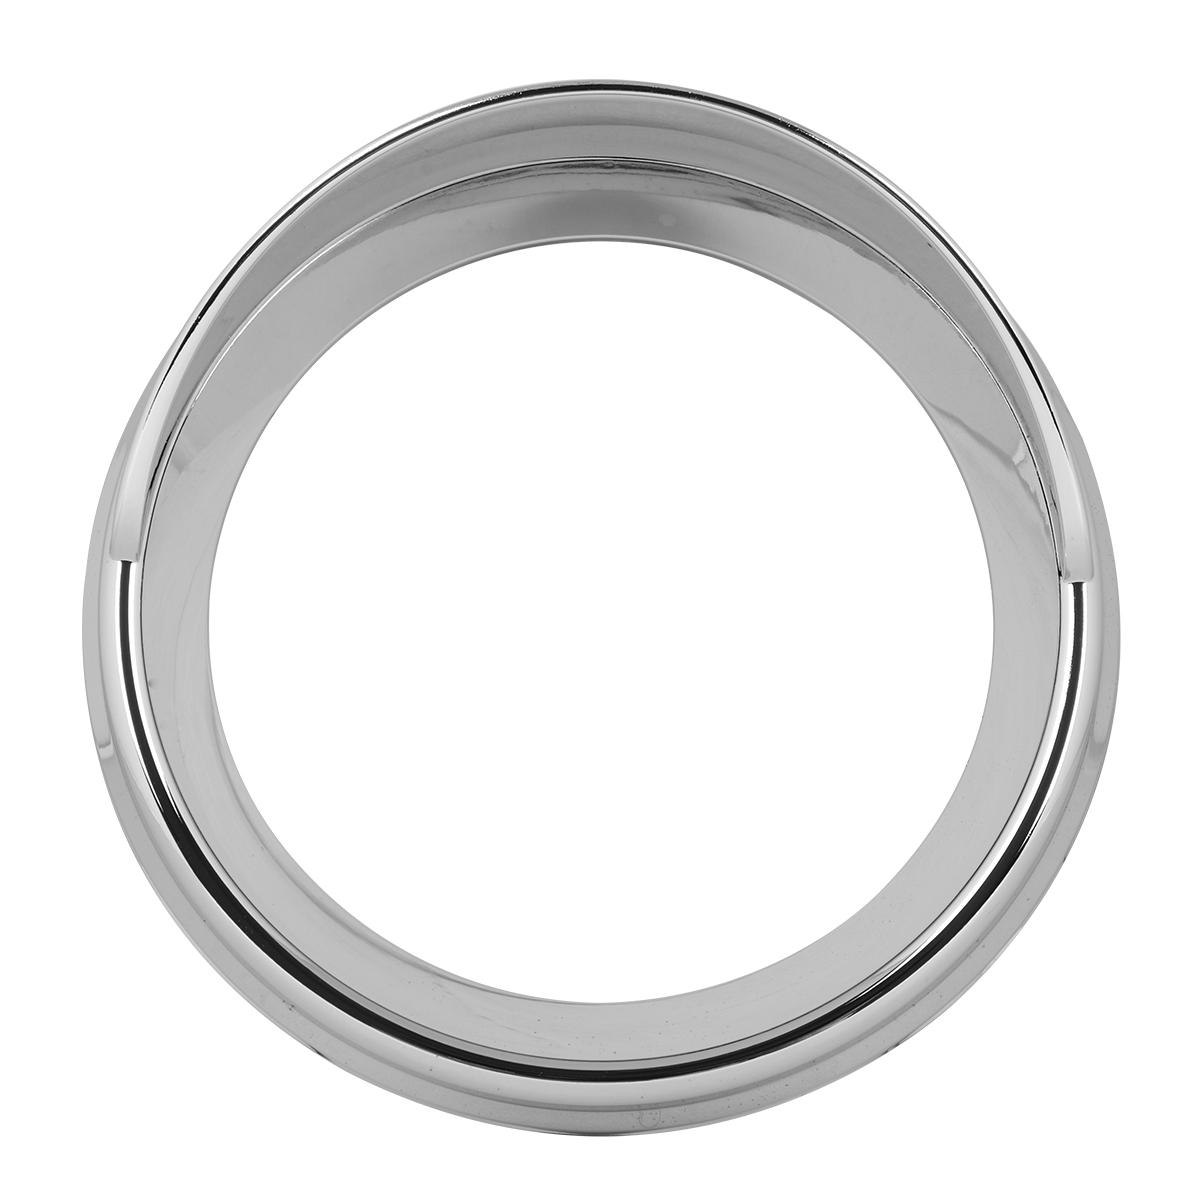 68396 Chrome Plastic Speed/Tachometer Snap-On Gauge Cover w/ Visor for KW